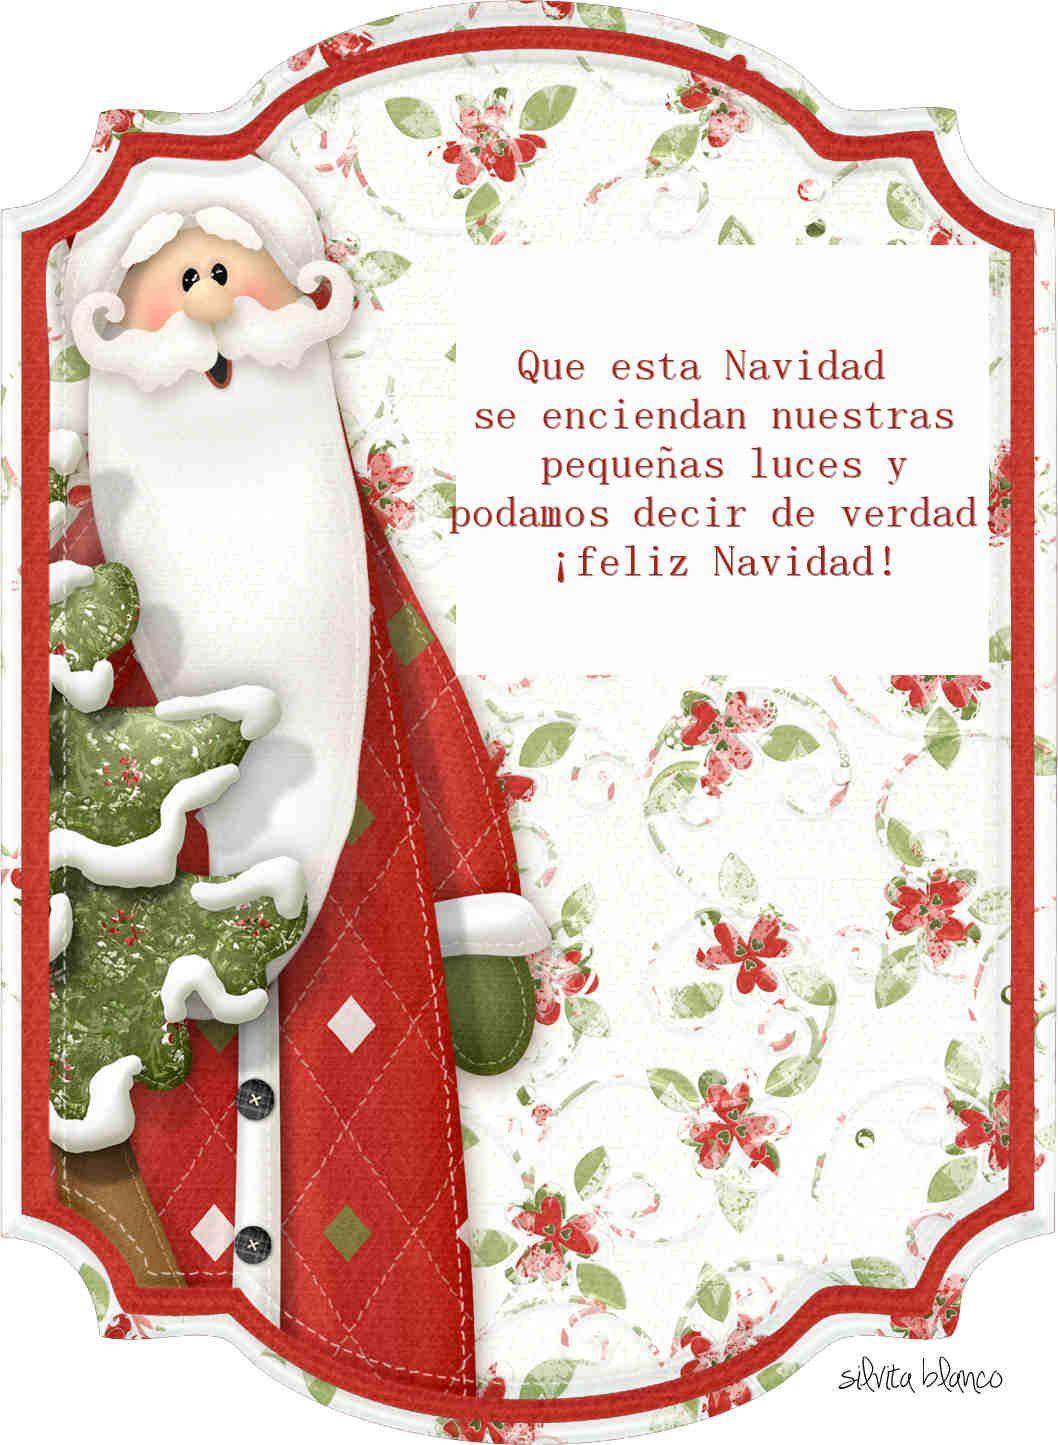 Frases de navidad navidad pinterest frases de - Tarjetas de navidad elegantes ...